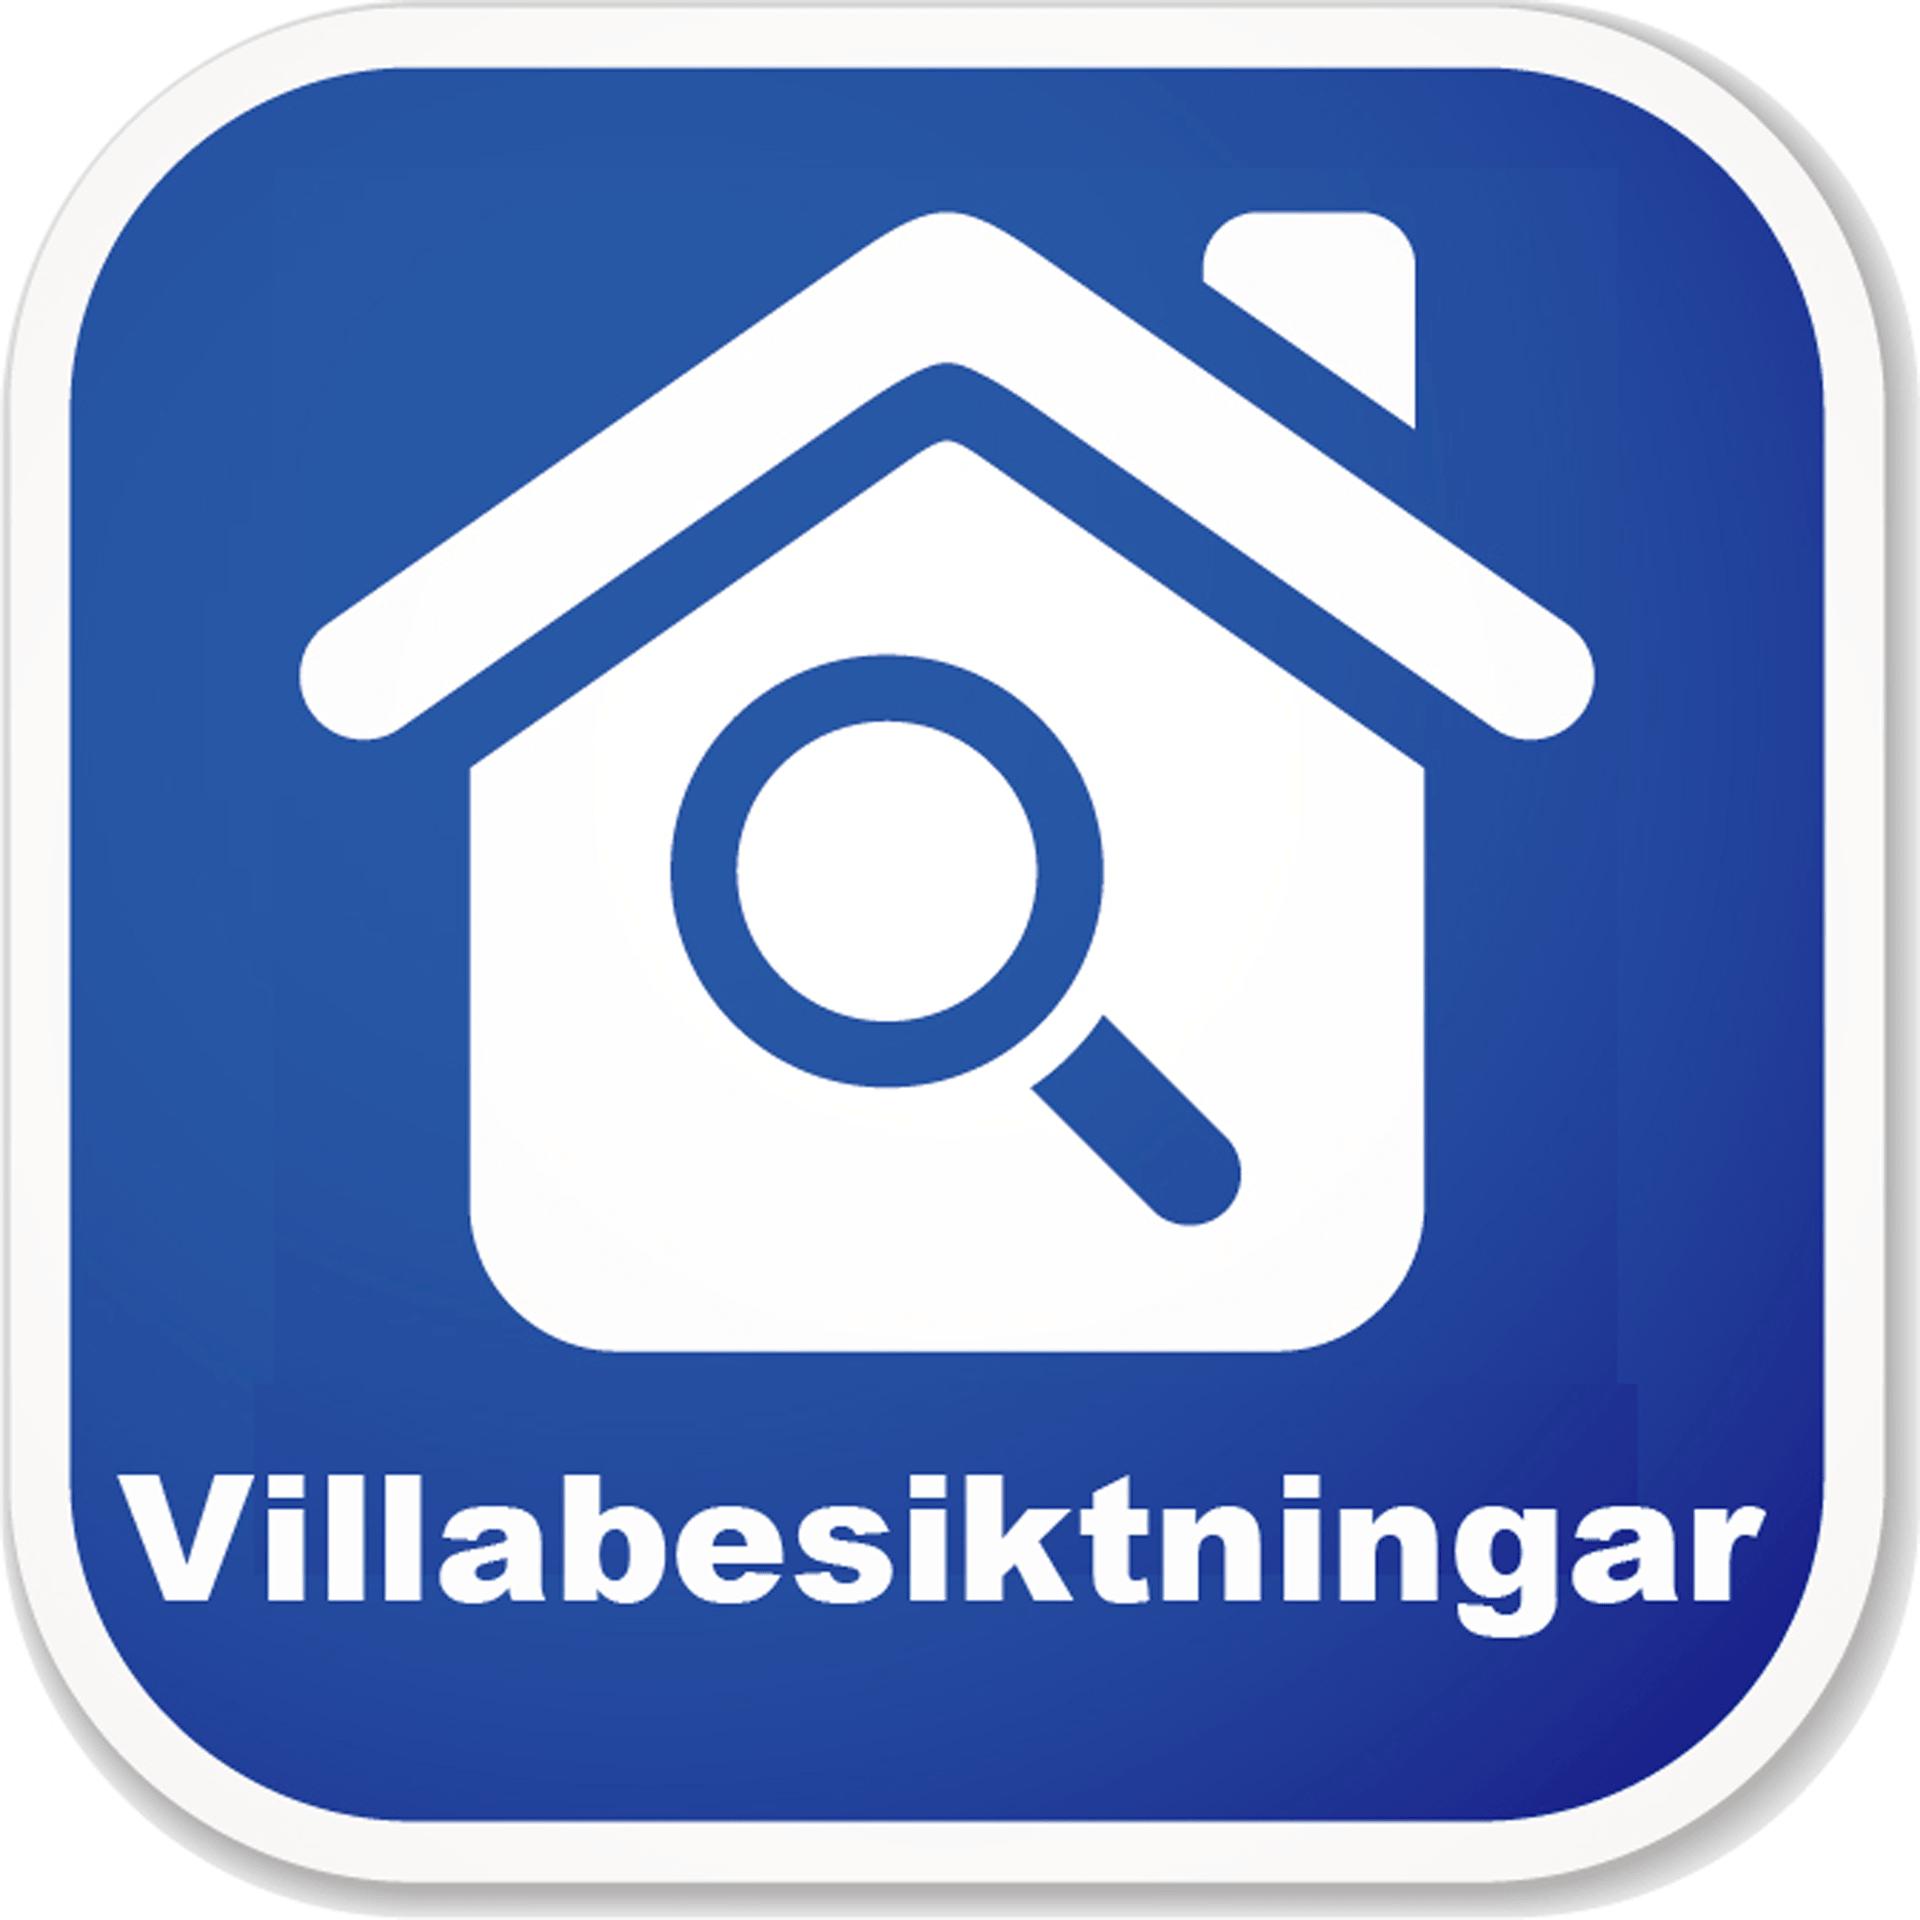 Villabesiktningar i Stockholm AB